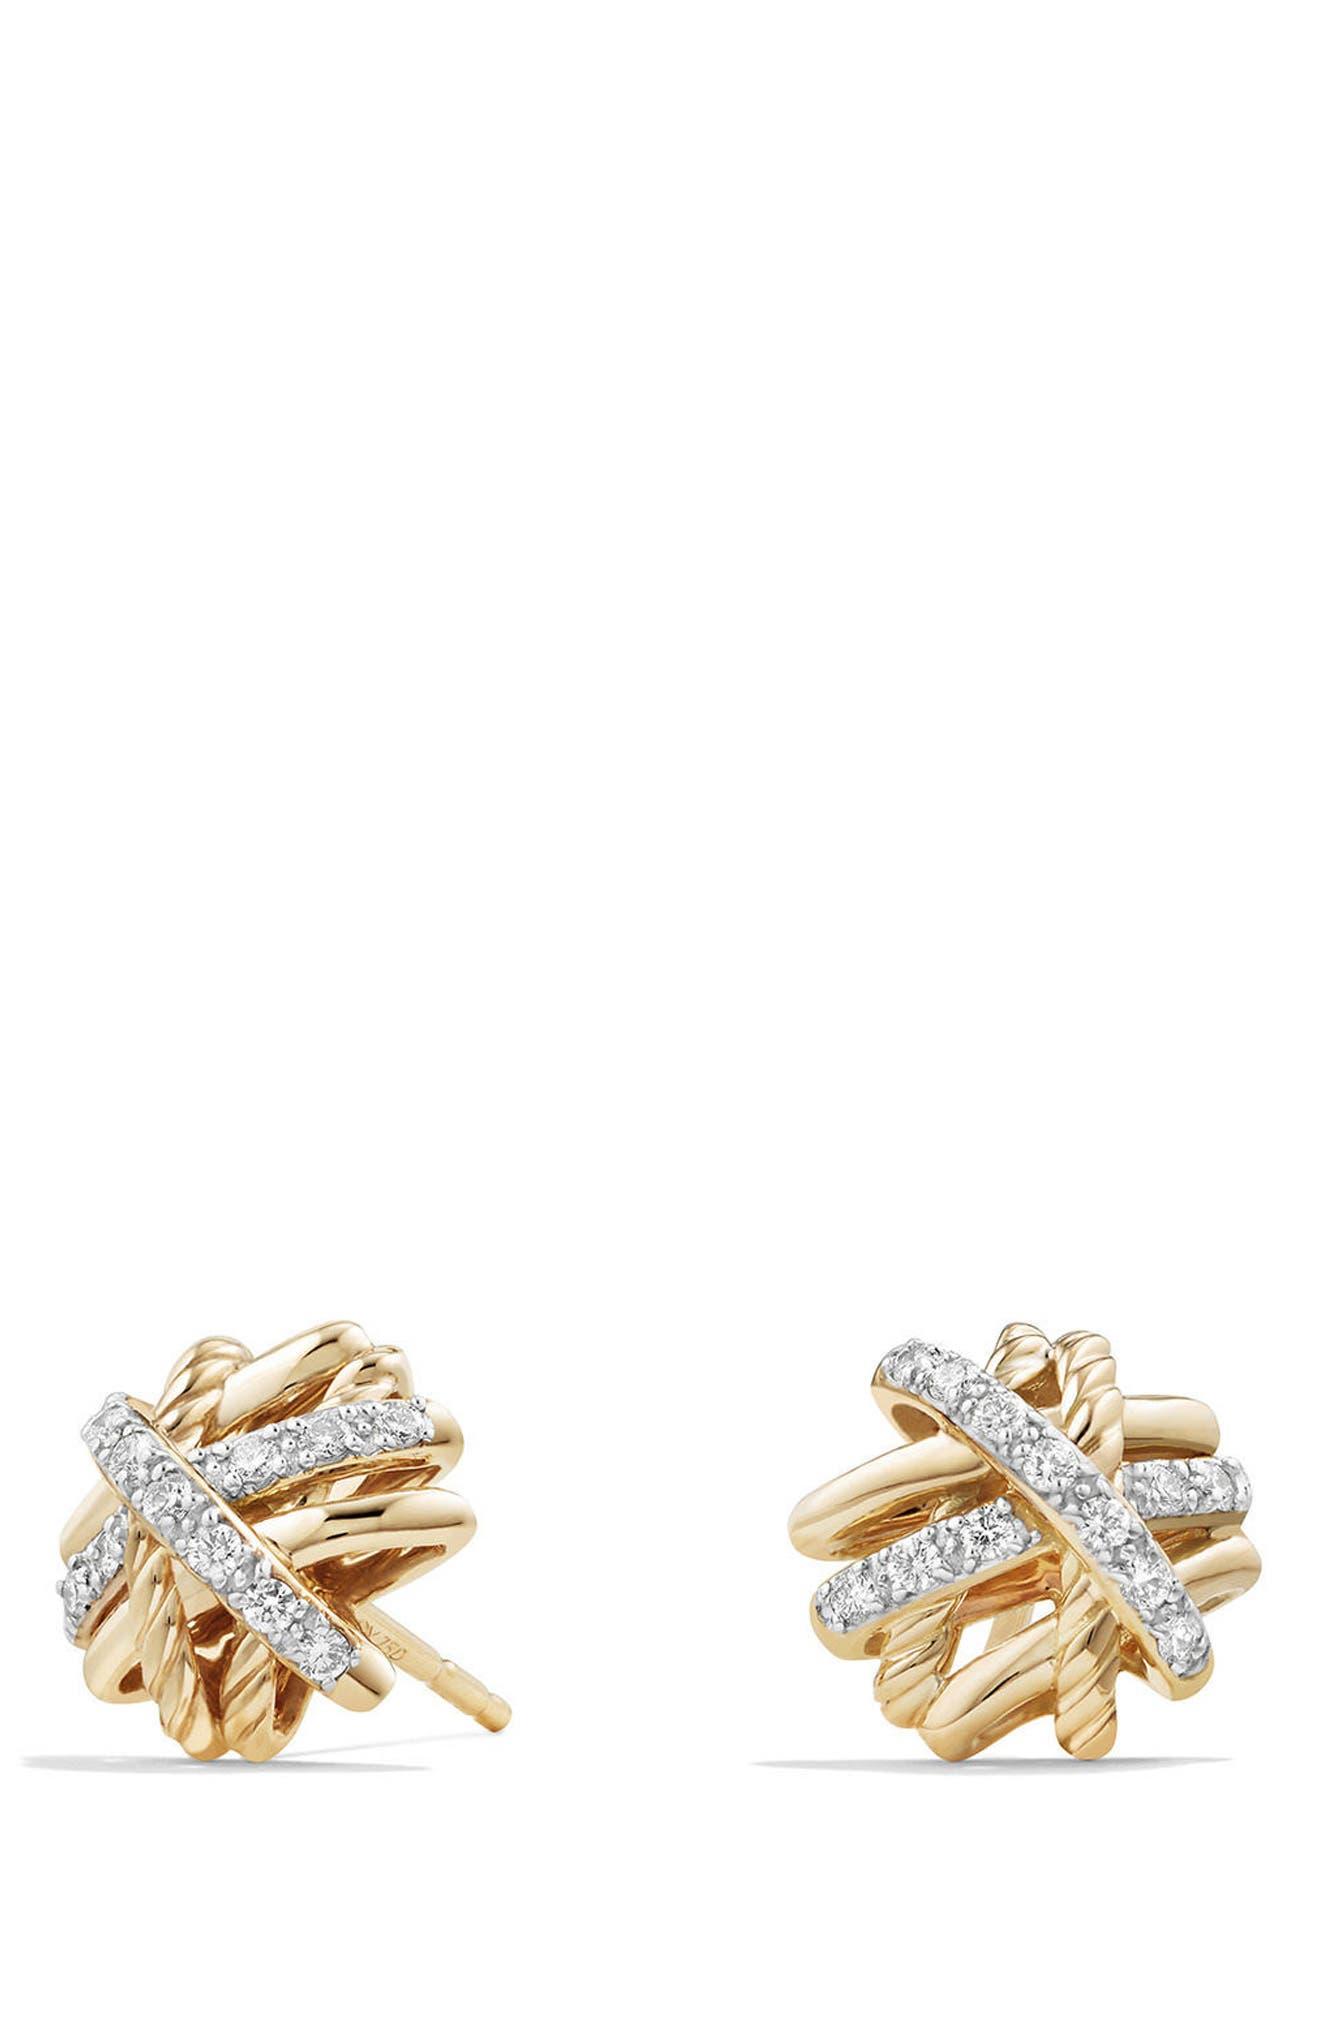 DAVID YURMAN Crossover Stud Earrings with Diamonds in 18k Gold, Main, color, YELLOW GOLD/ DIAMOND